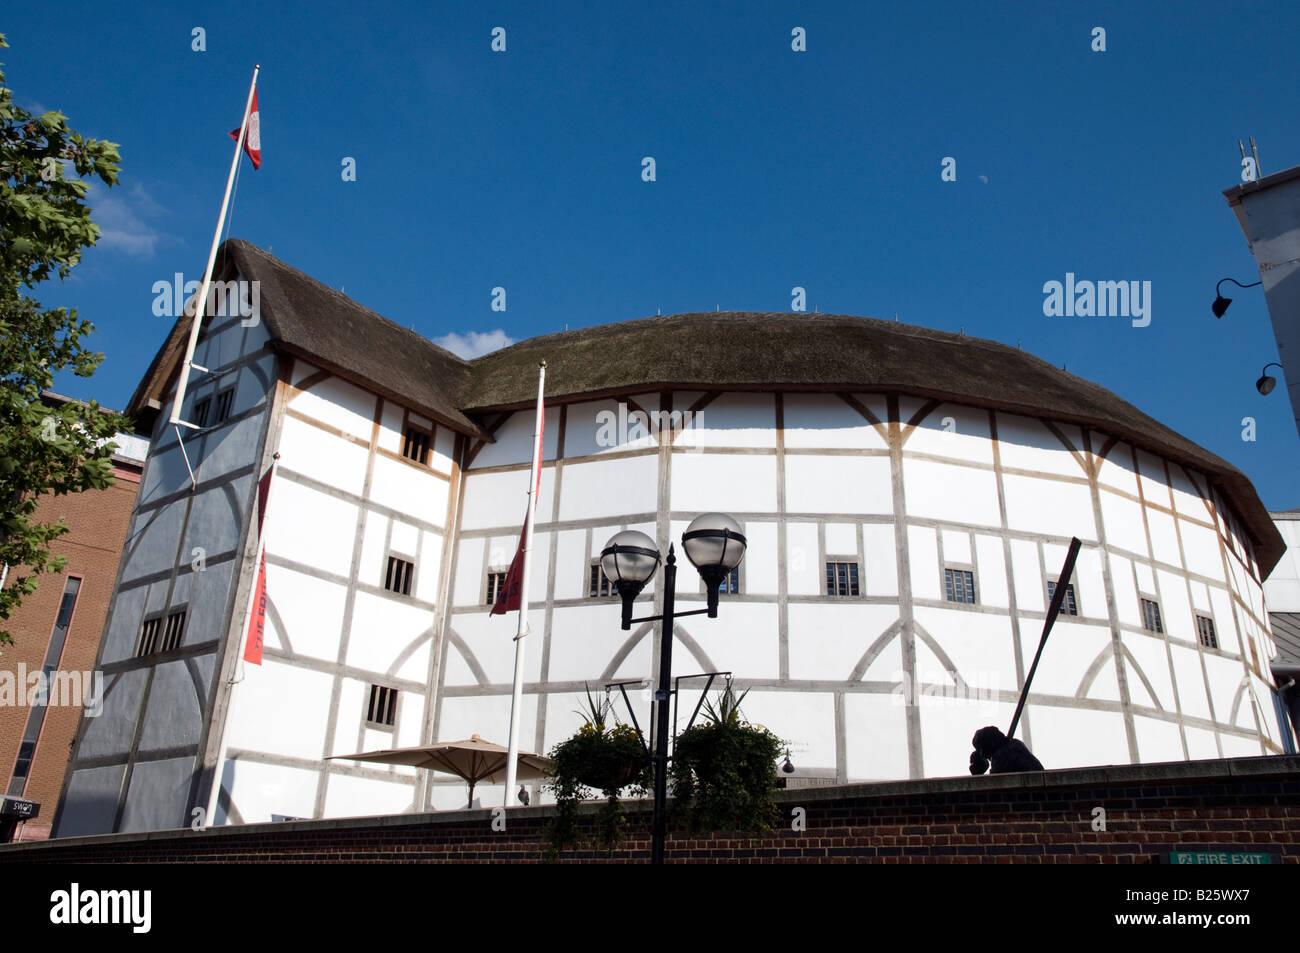 Shakespeare's Globe Theatre, London England UK - Stock Image